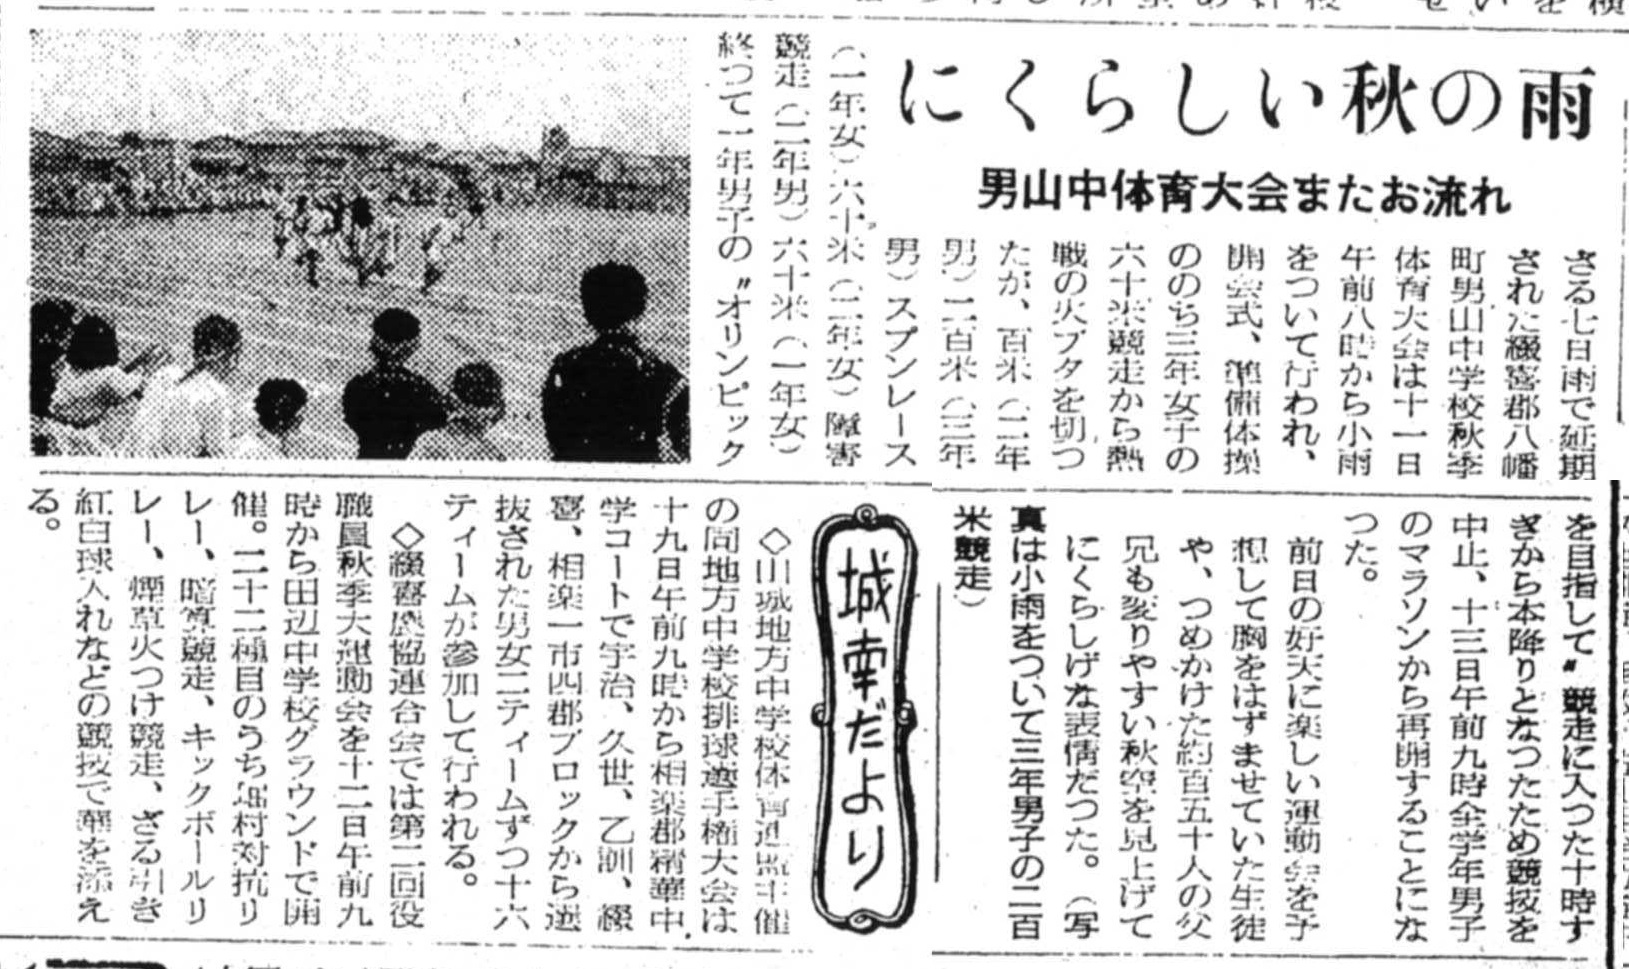 S27.10.12KY 淀中学校大運動会 京阪バス臨時便b2